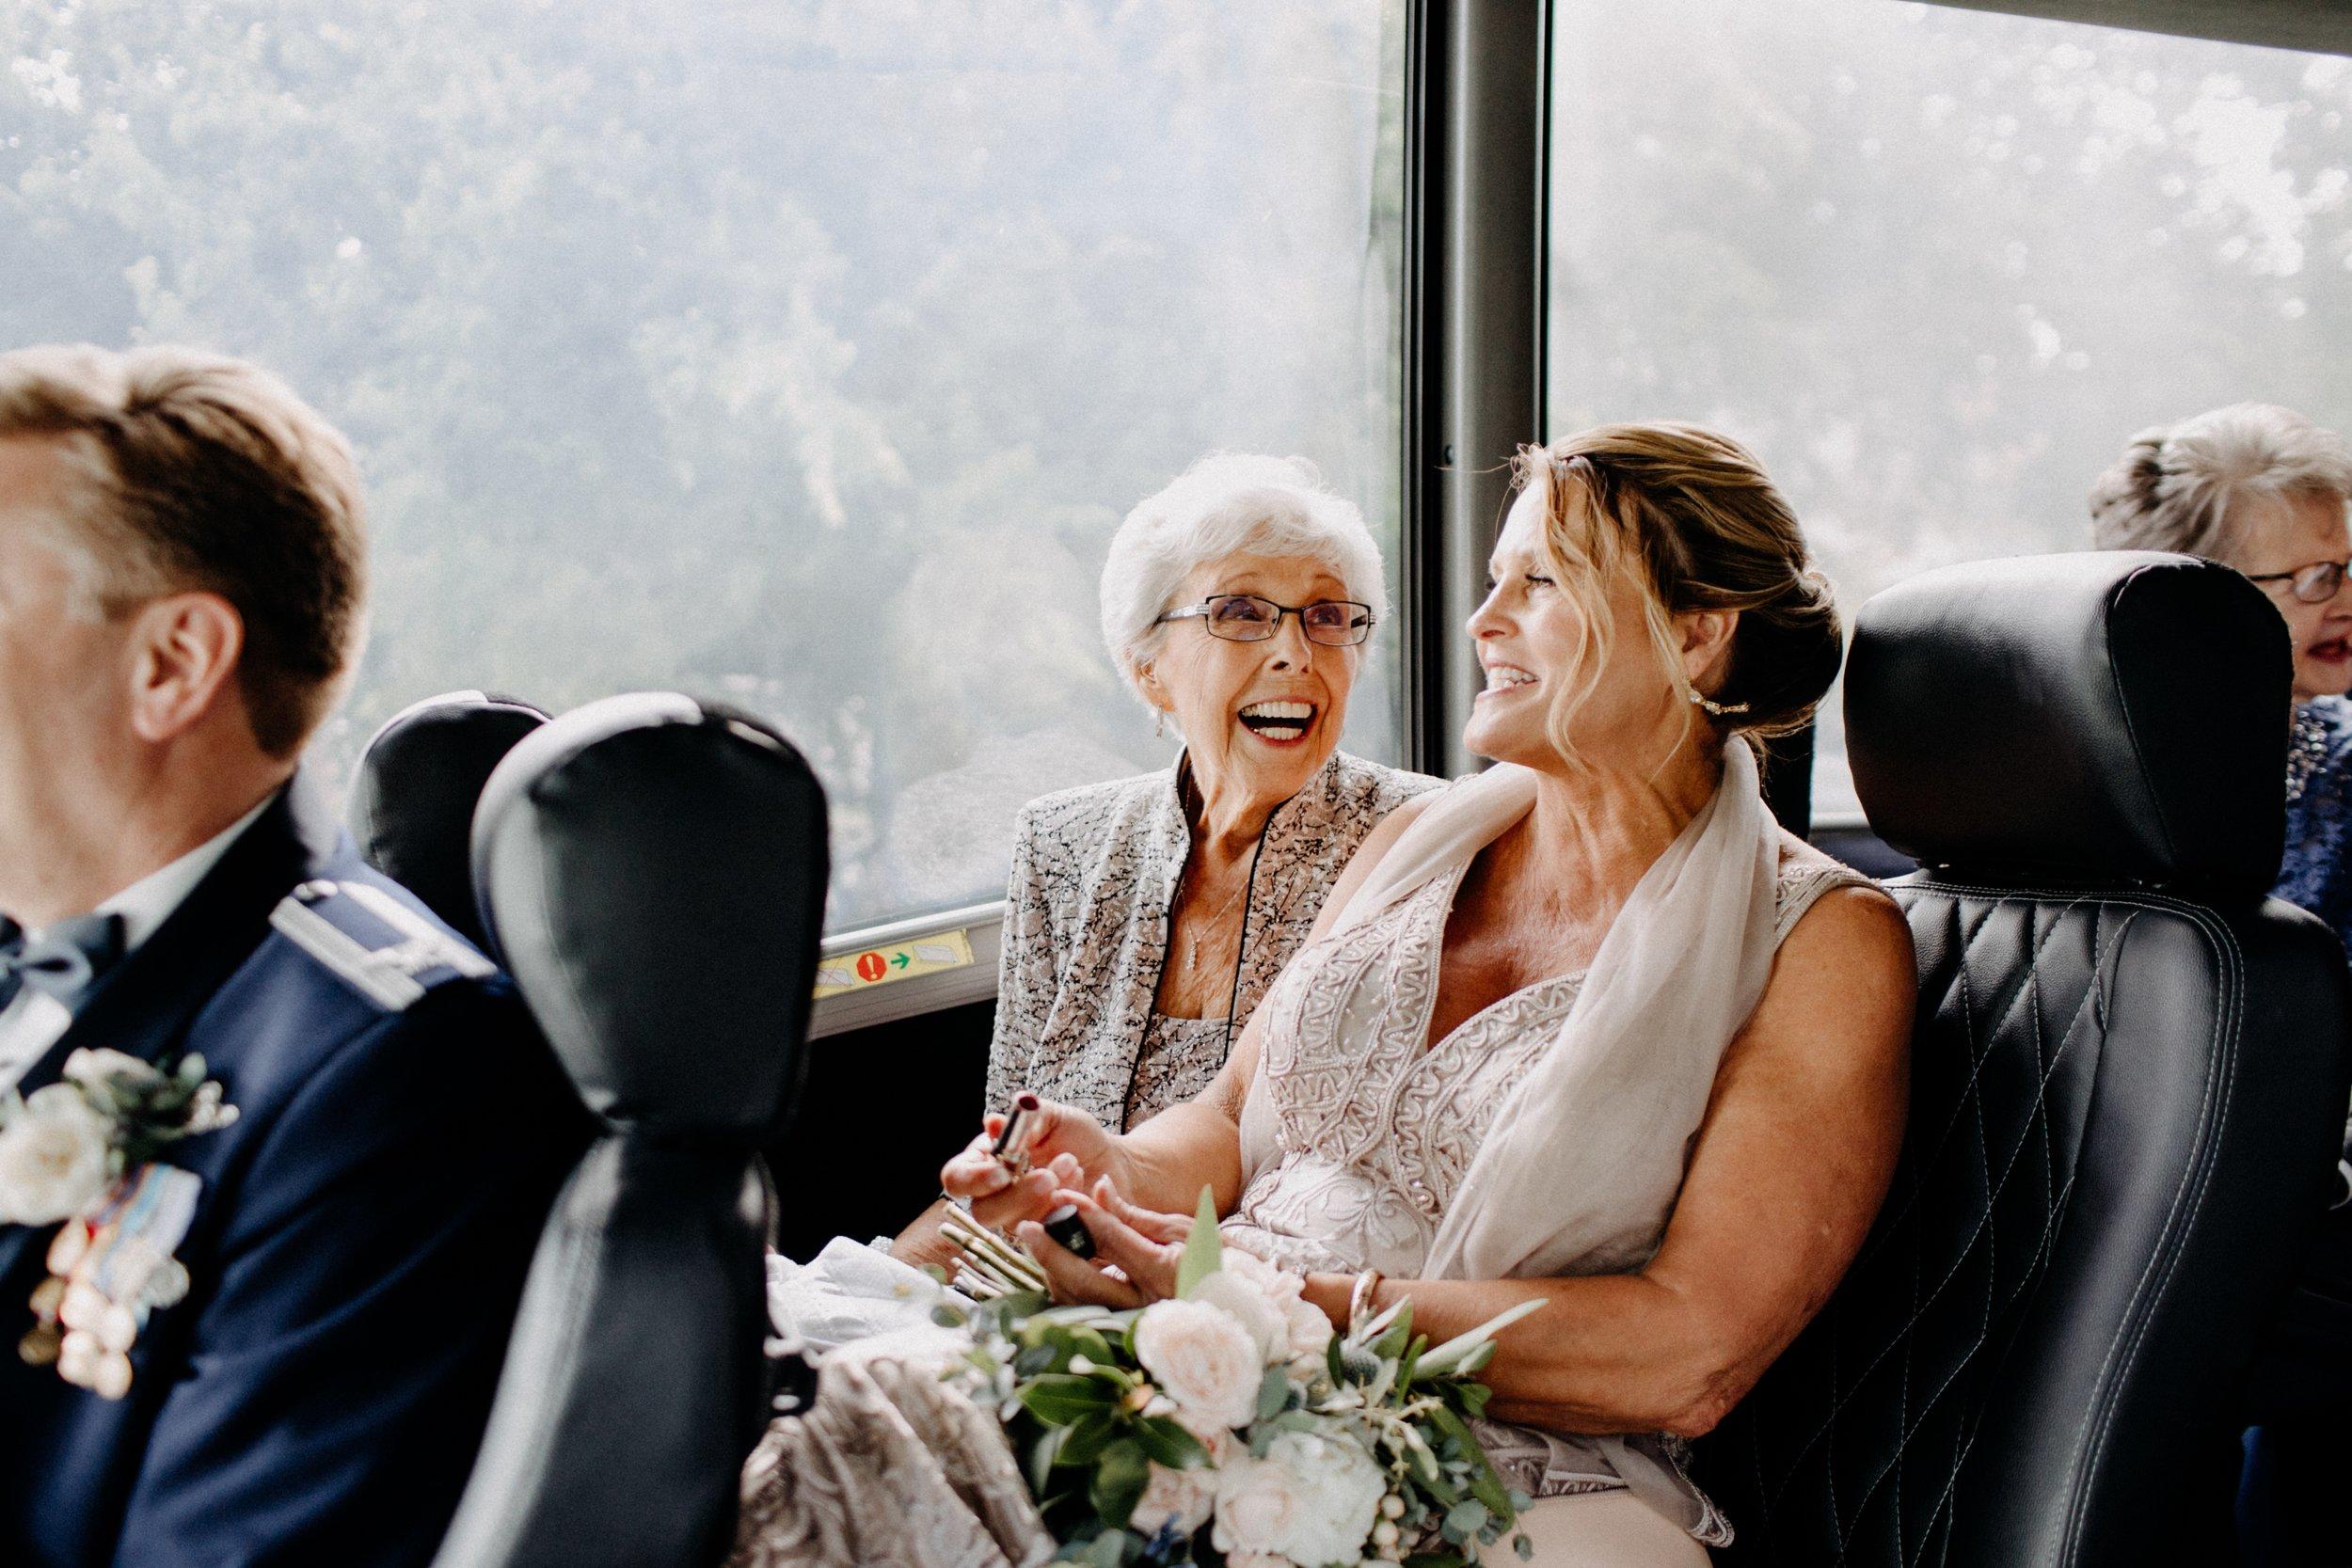 st-anthony-hotel-wedding-photography-10094san-antonio.JPG